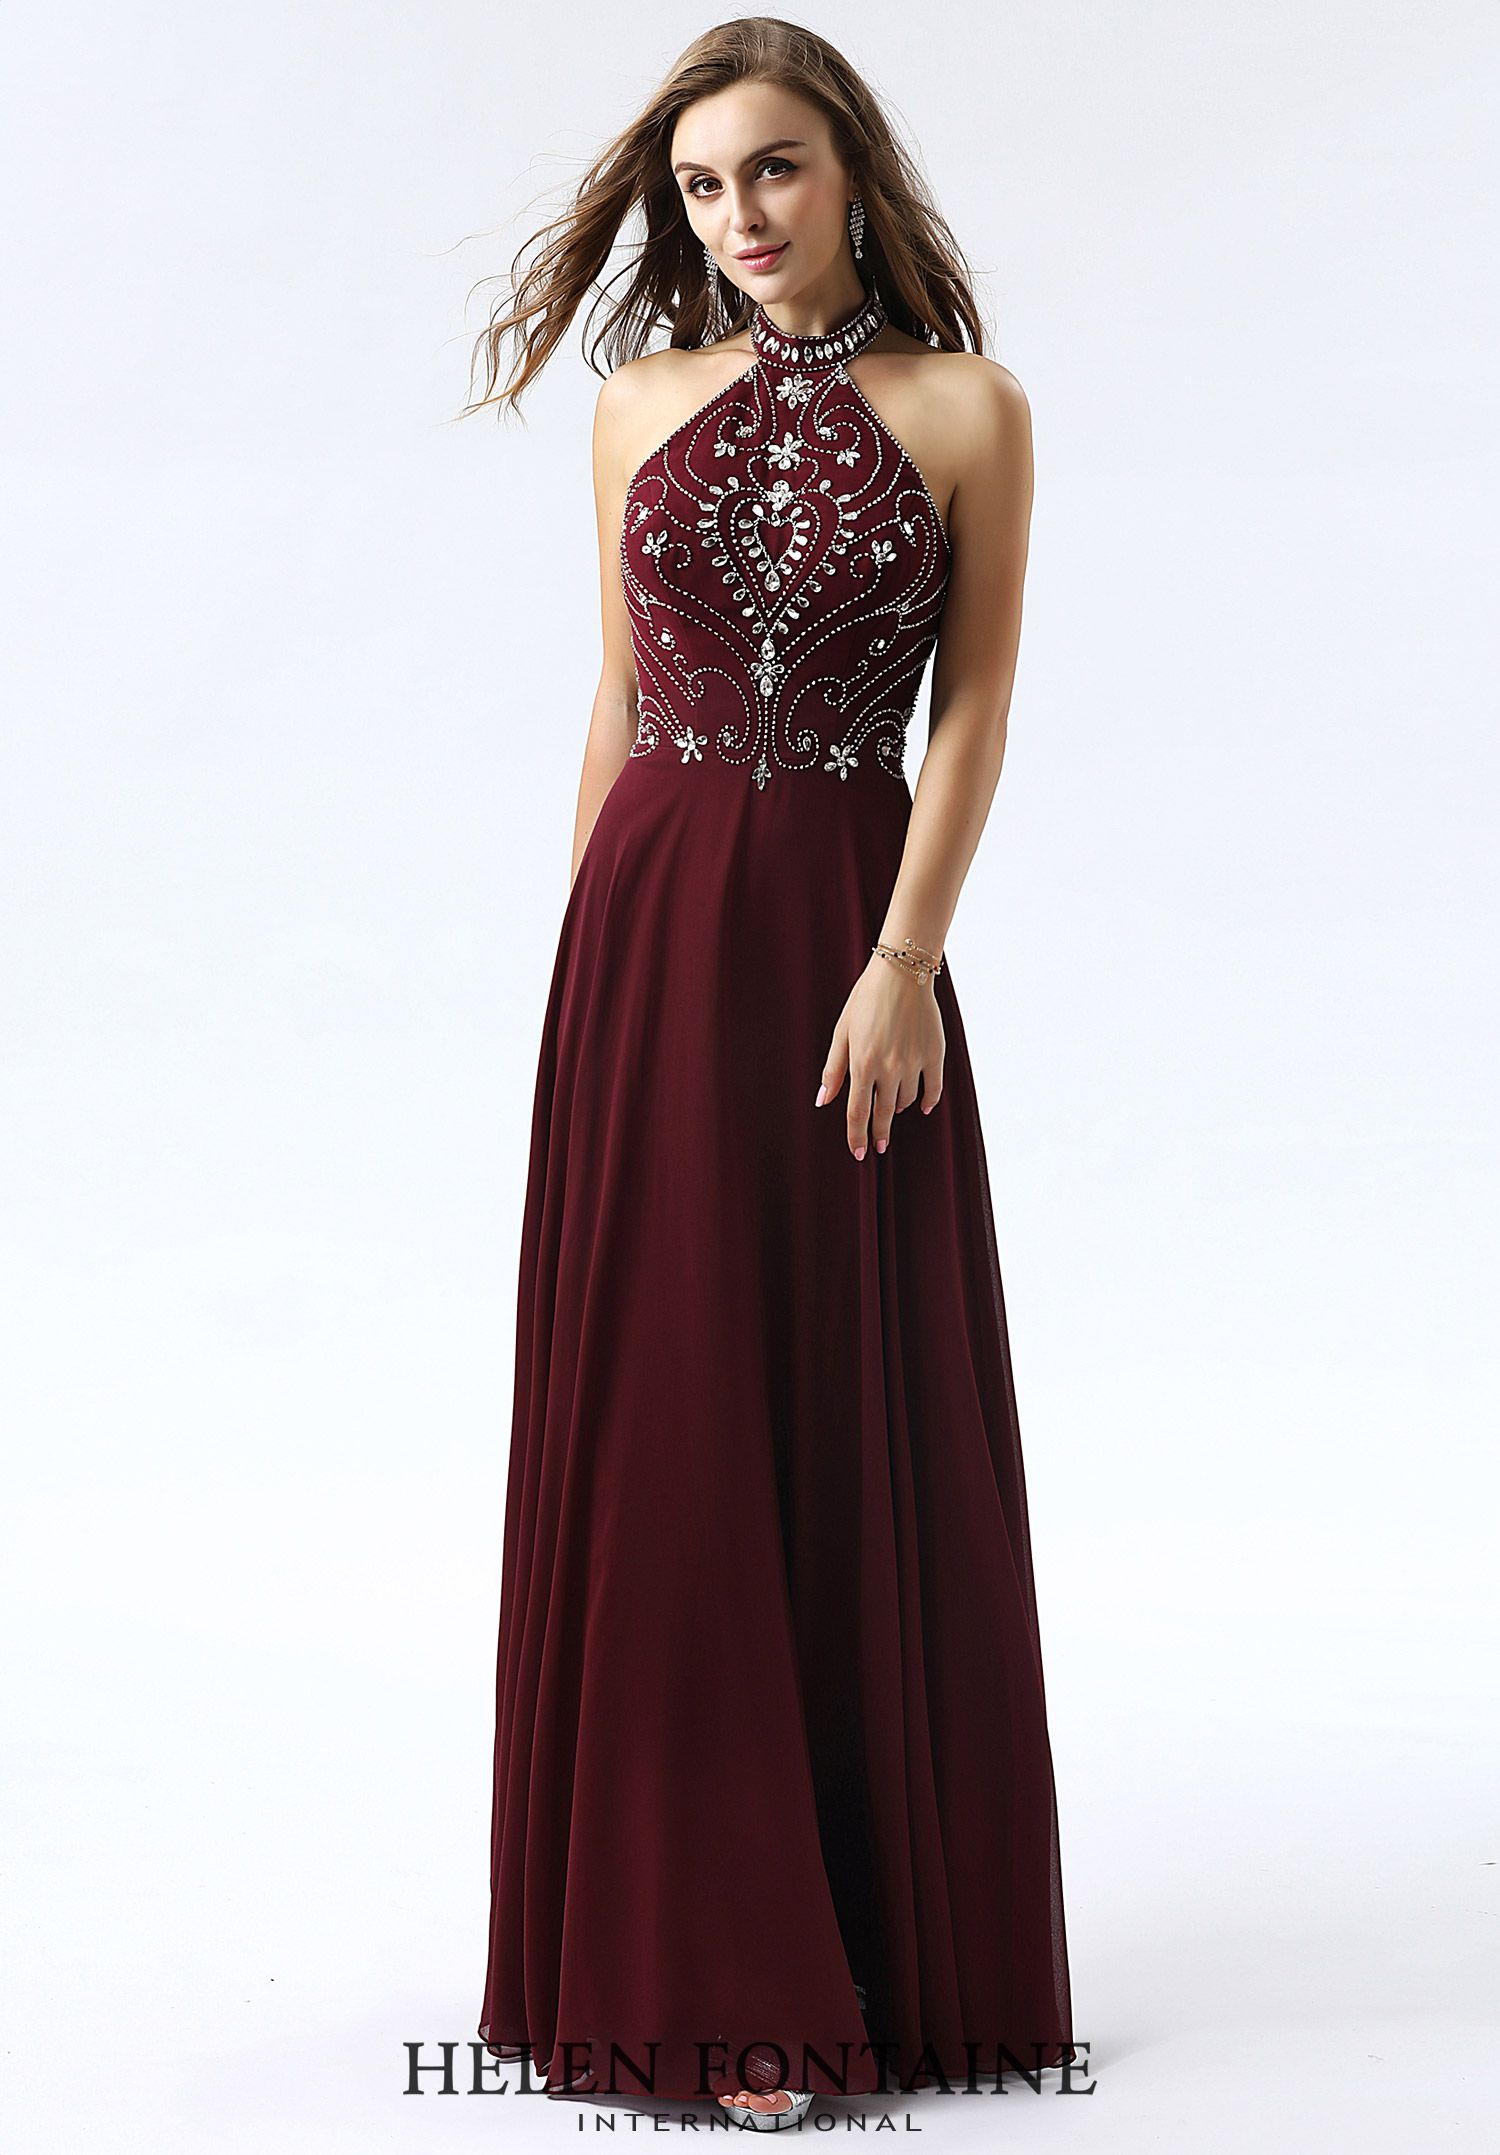 Vogue halter flowy sparkling top chiffon floor length dressstyle